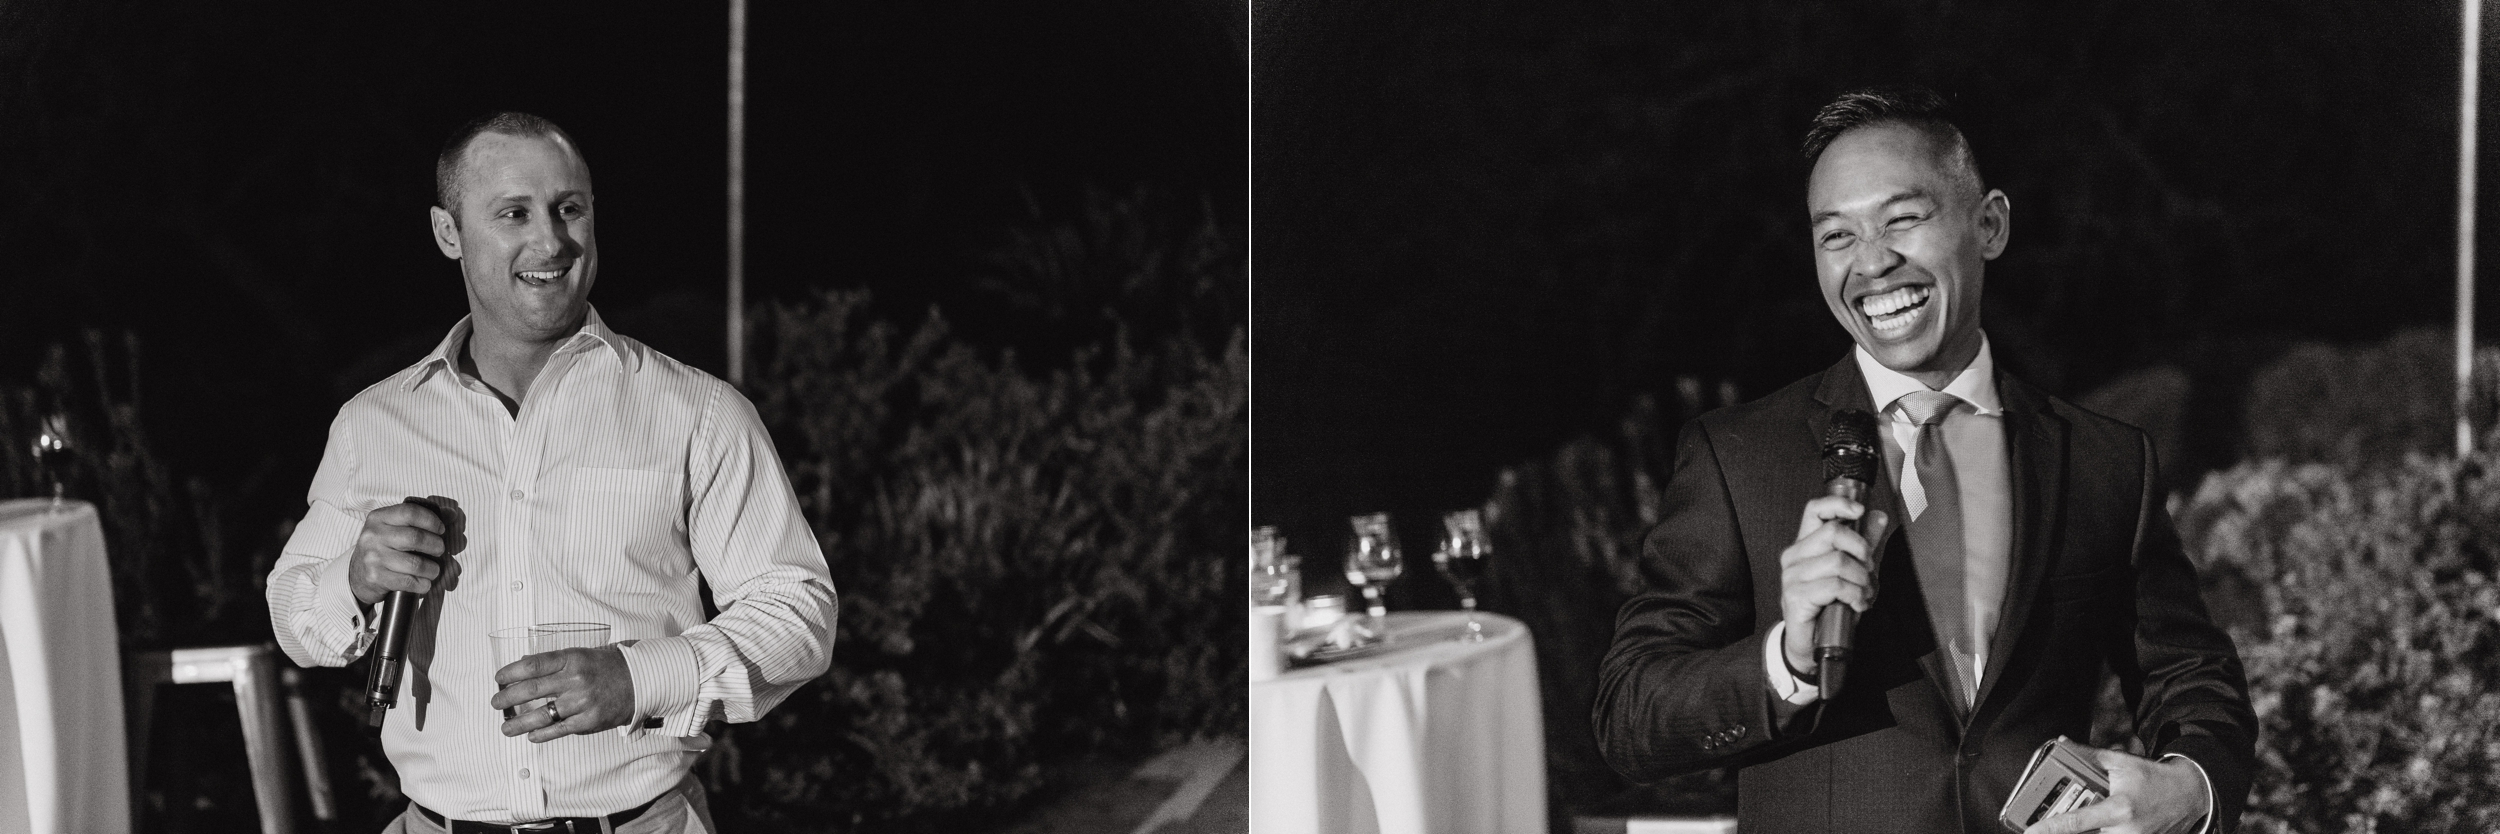 098marin-petaluma-backyard-wedding-vivianchen-632_WEB.jpg